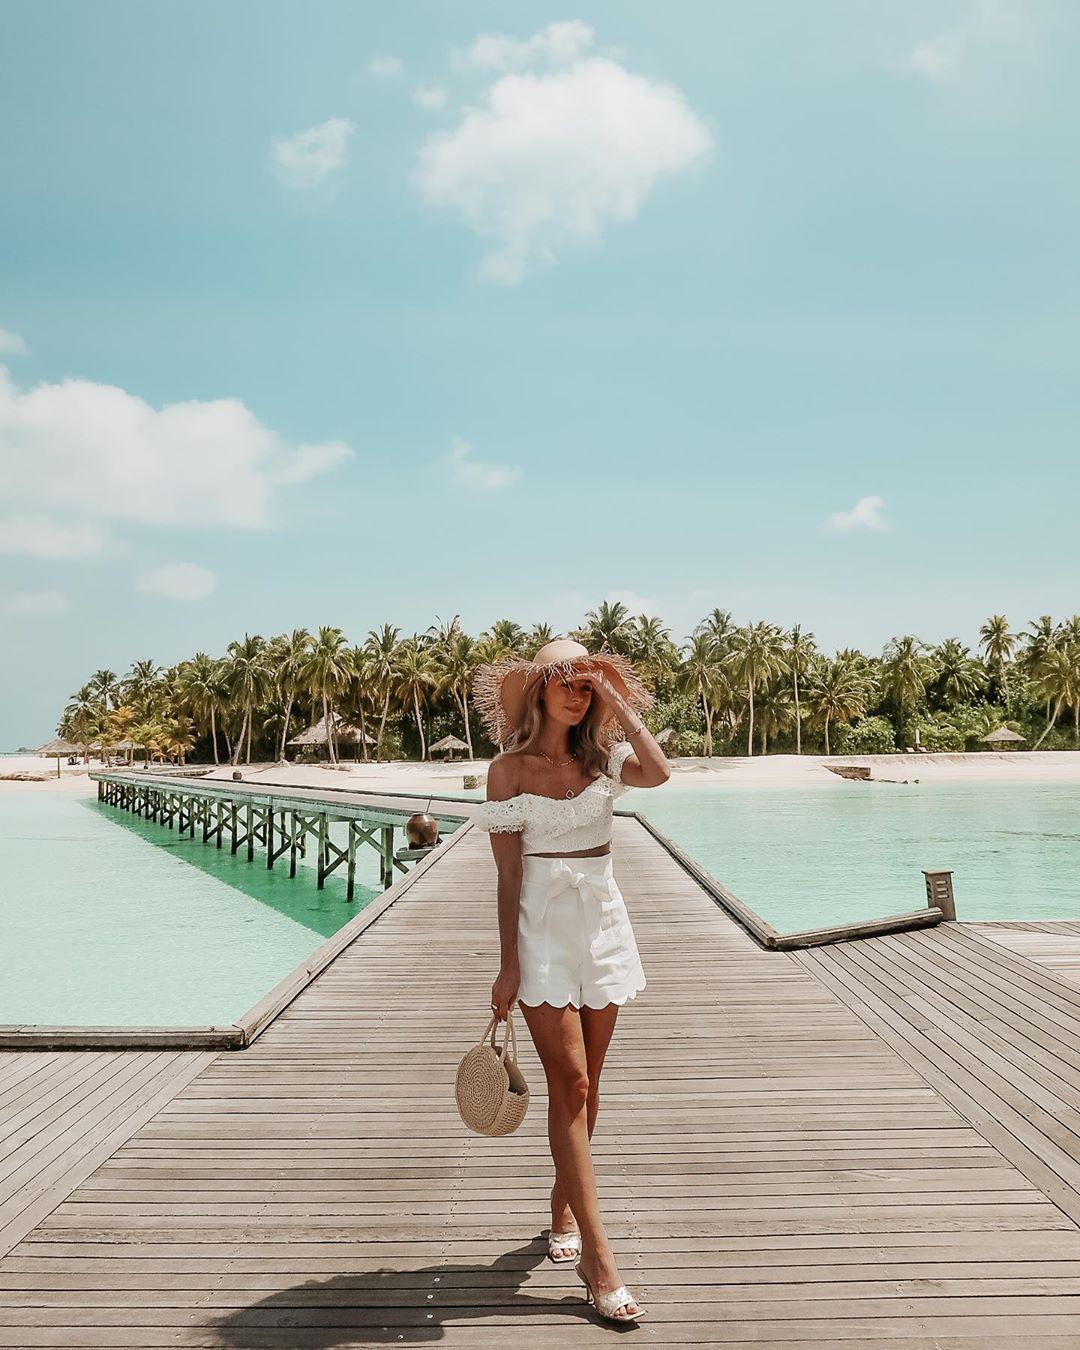 Josie Fashion Mumblr On Instagram Alexa Play Orinoco Flow By Enya Fashion Mumblr Beach Photography Poses Vacation Style